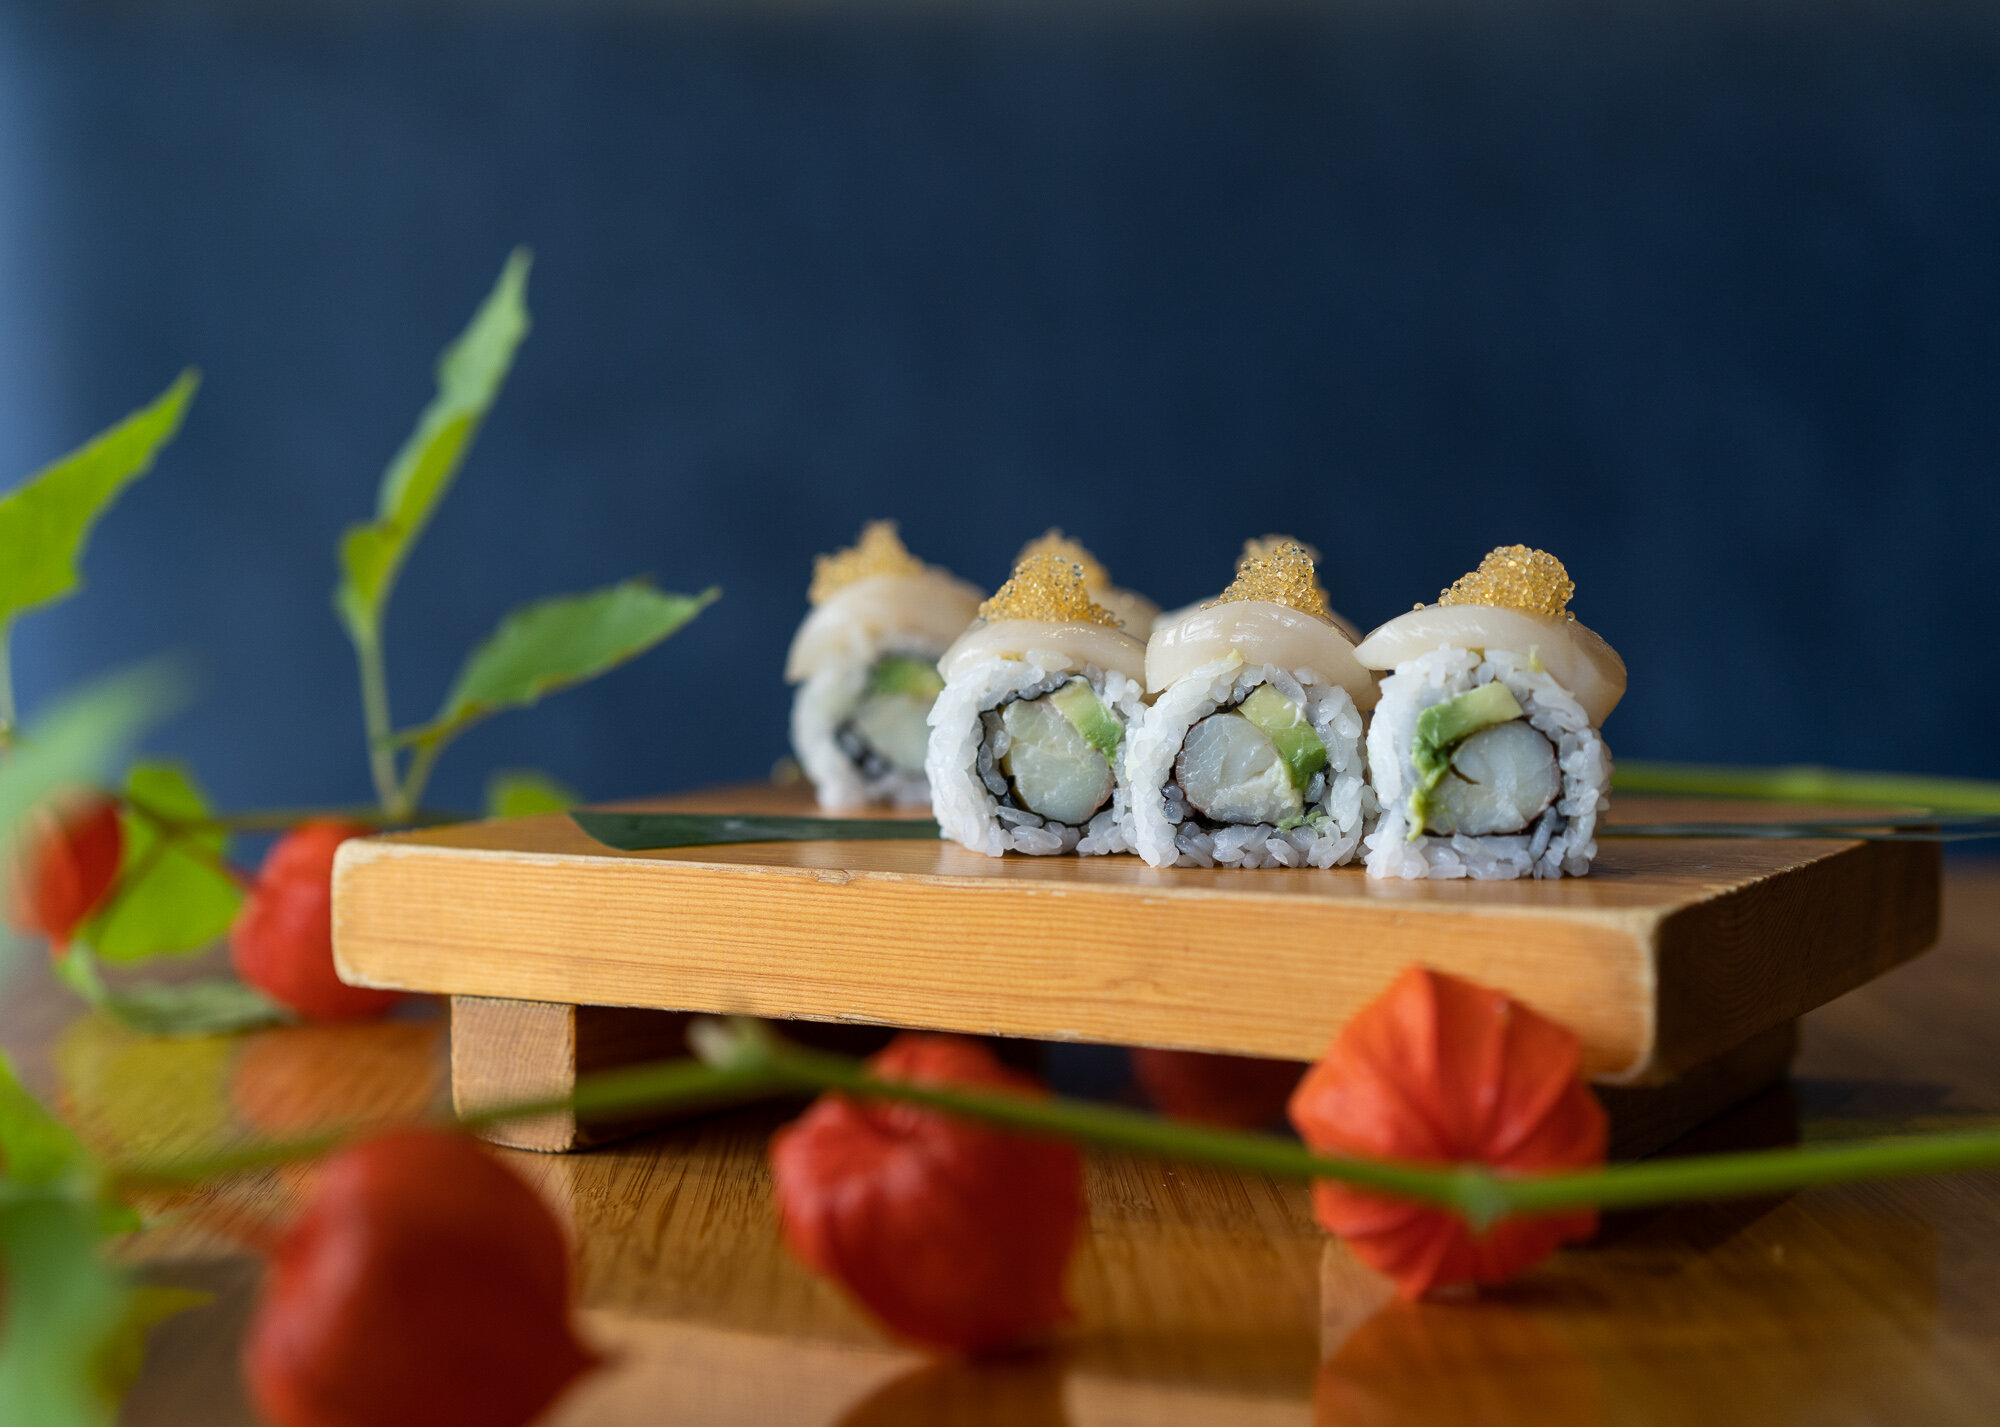 Pacific Northwest Roll - one of Tojo's signature rolls.